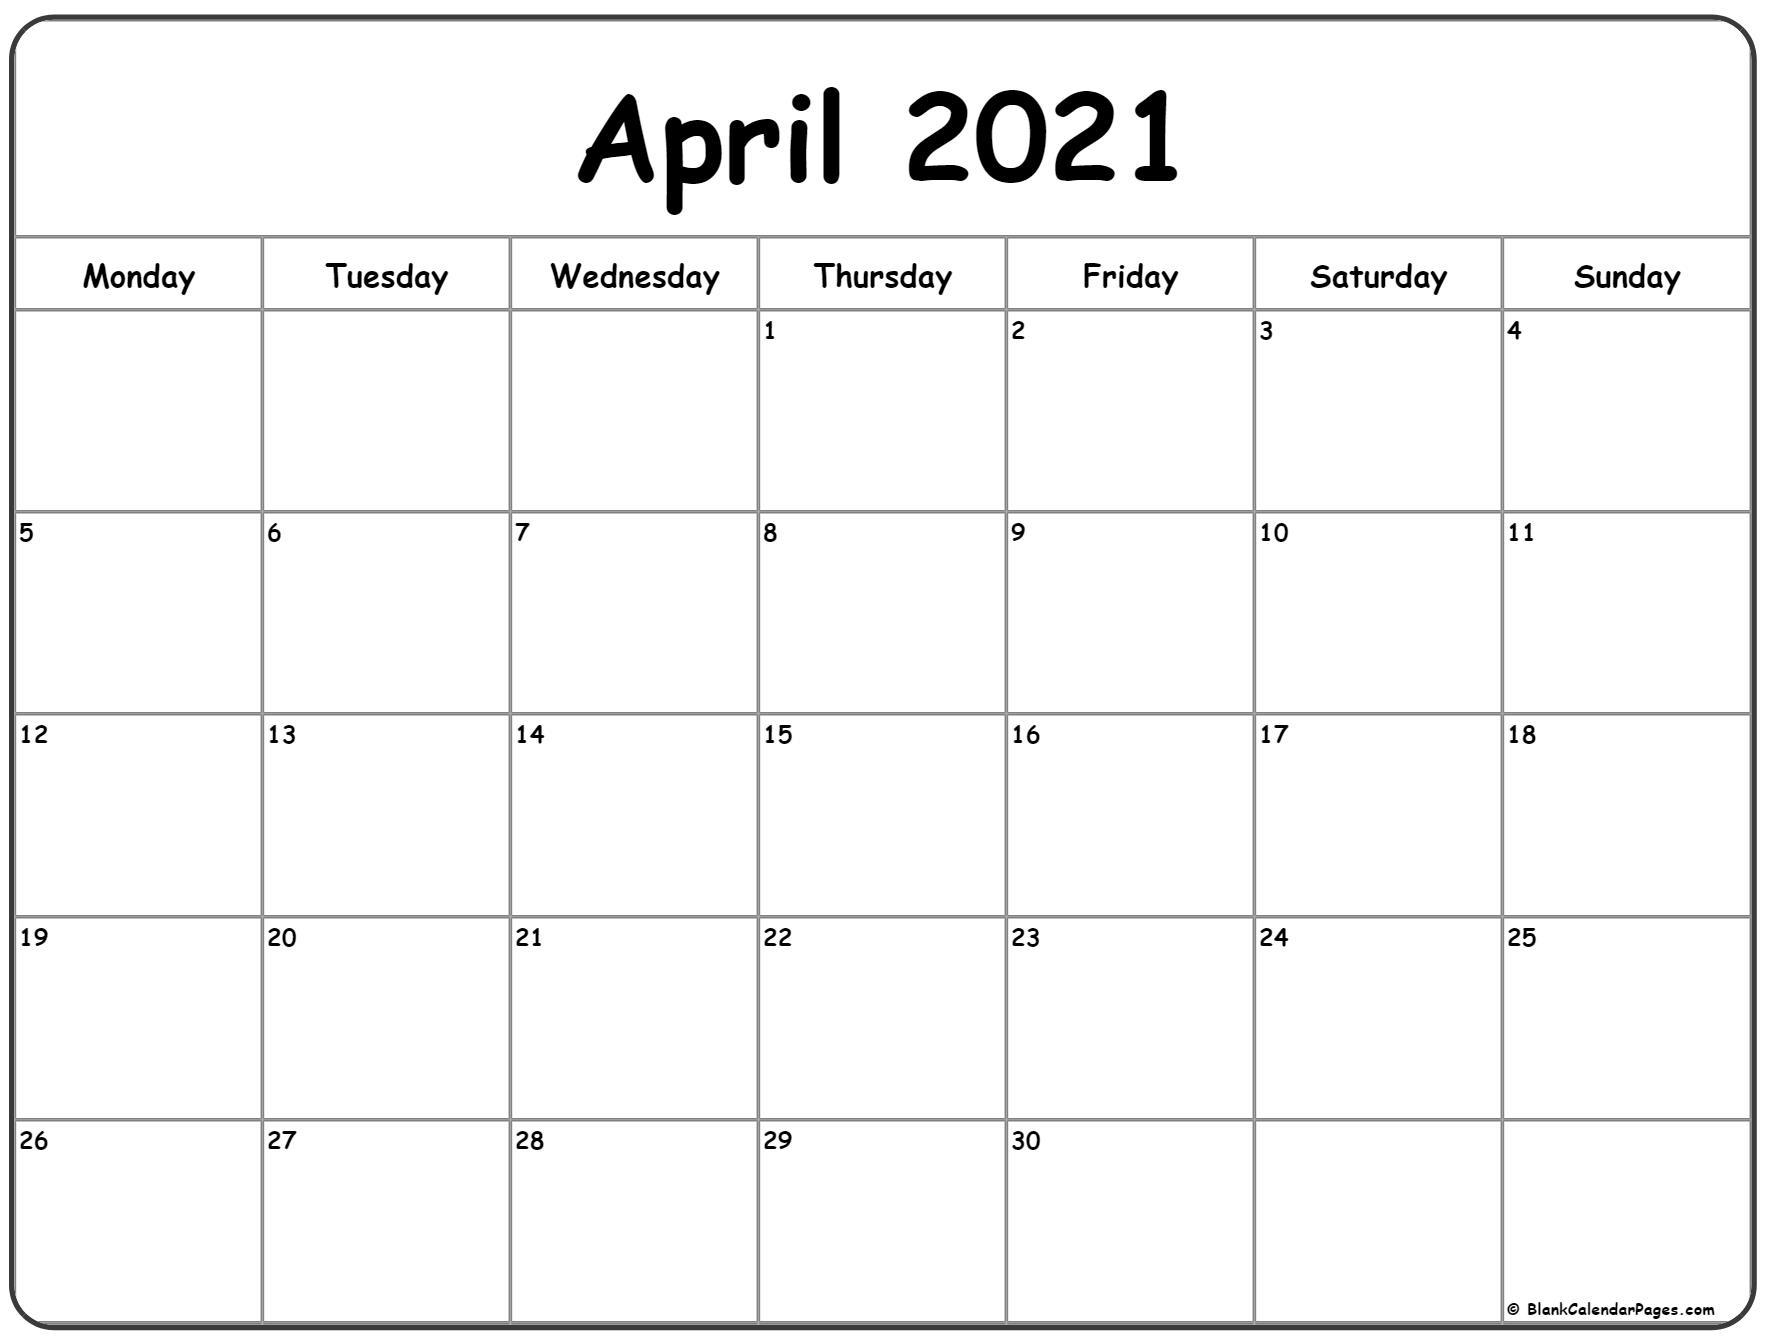 April 2021 Calendar Easter | Printable Calendars 2021 with regard to Printable Calendars 2021 Sunday To Saturday